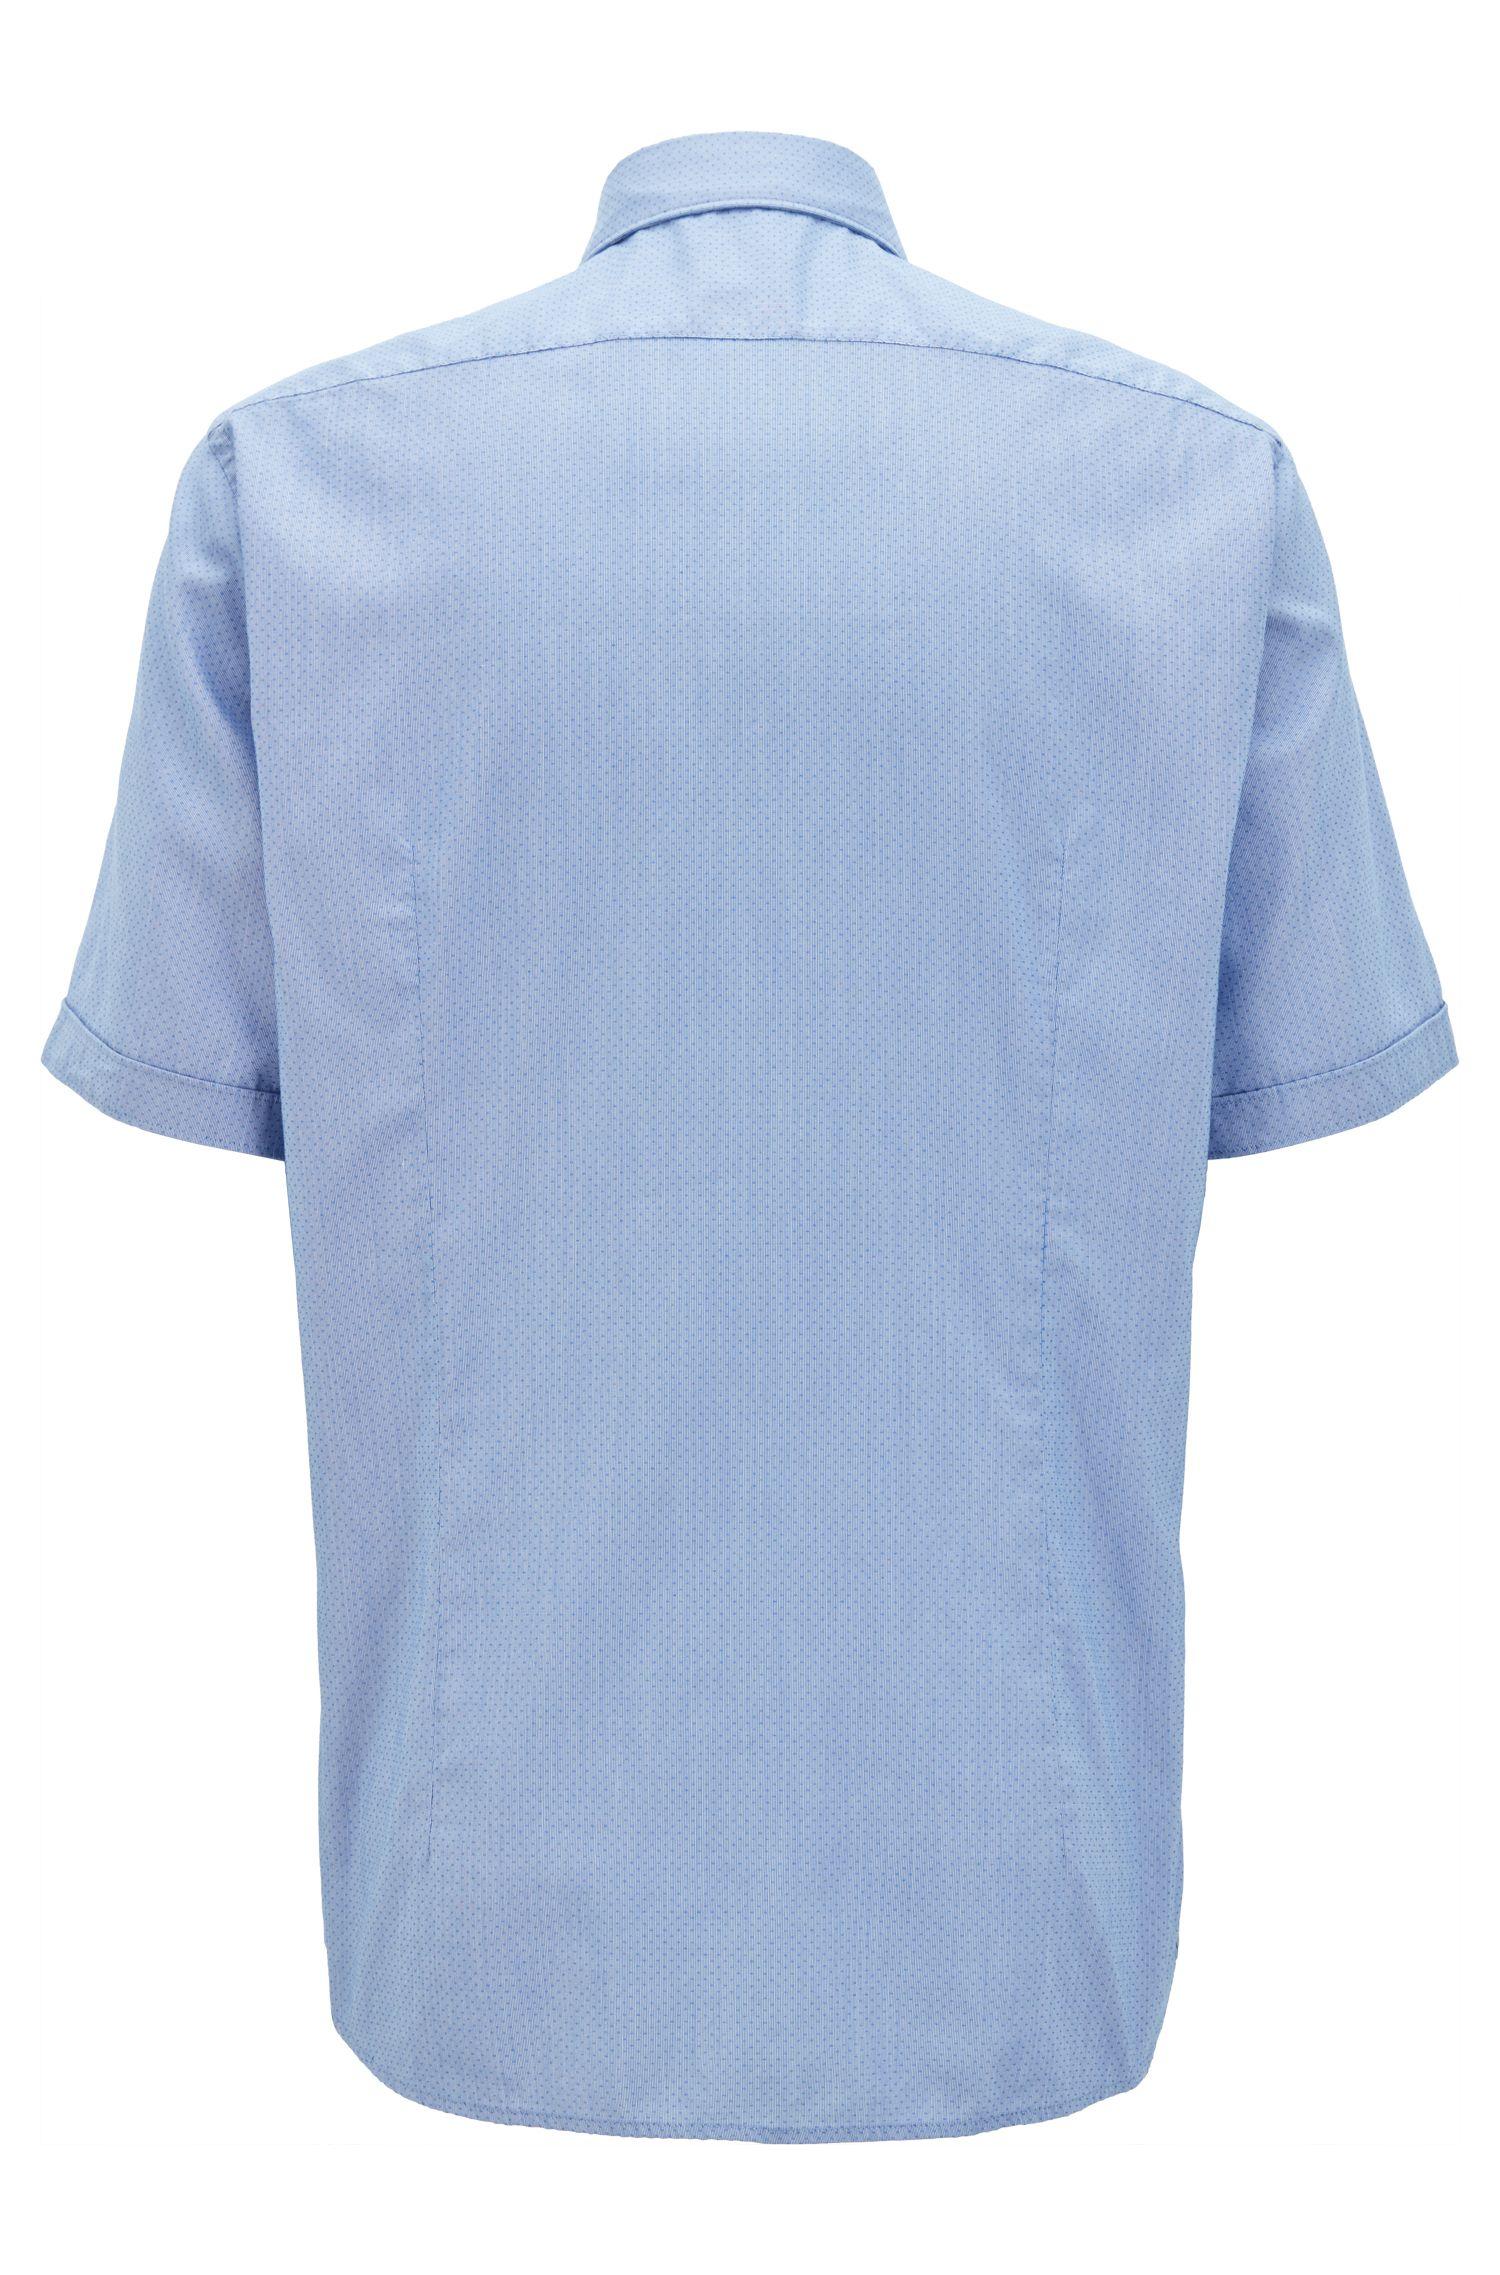 Cotton Lyocell Sport Shirt, Regular Fit | Luka